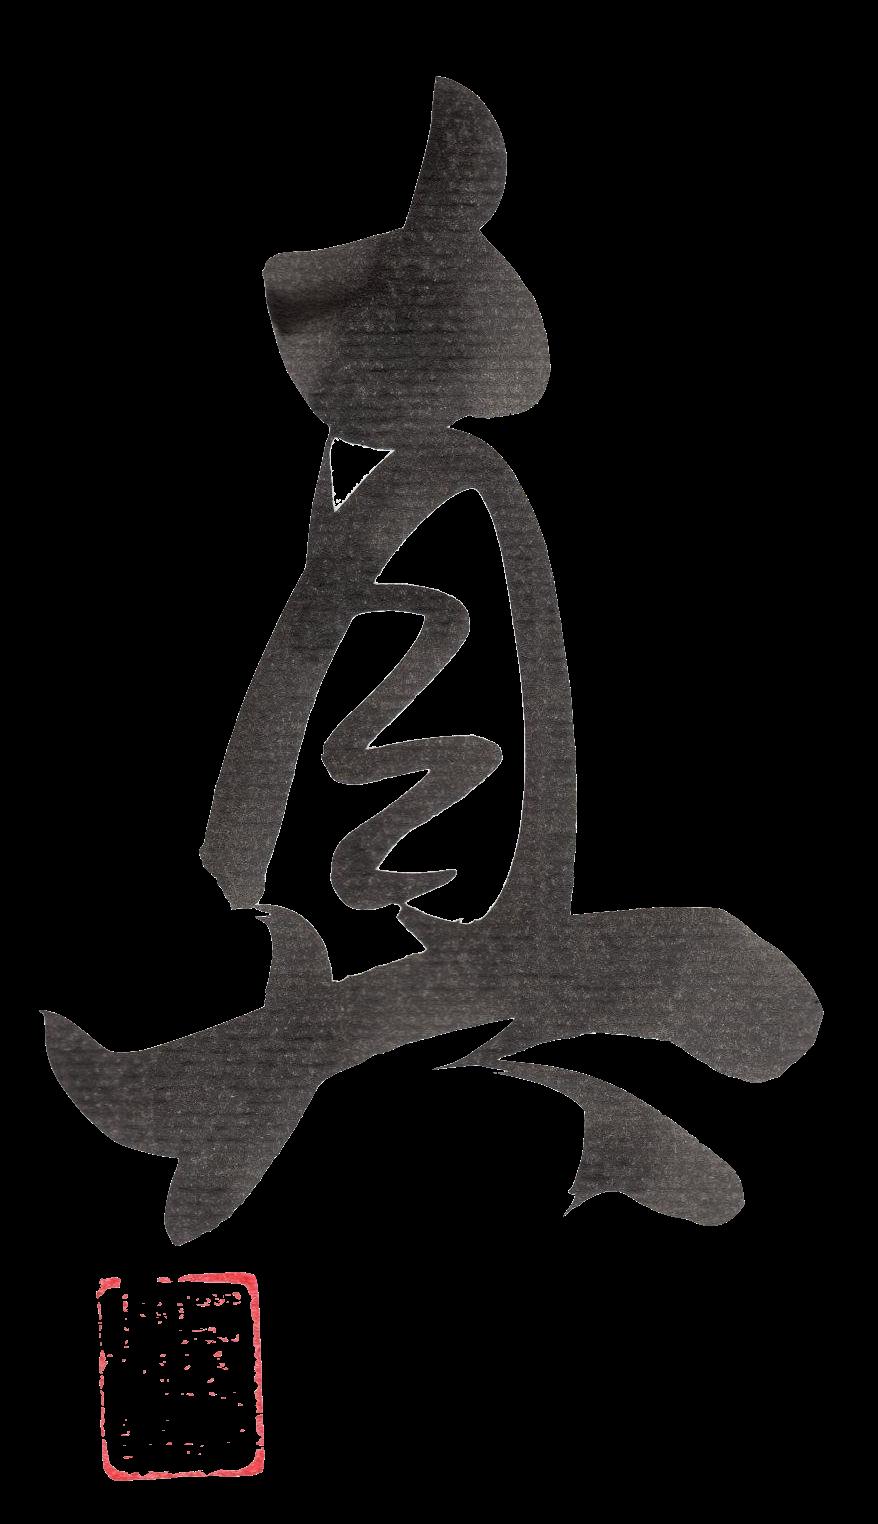 Calligraphie Japonaise de Philippe Cocconi - Shin  Vrai